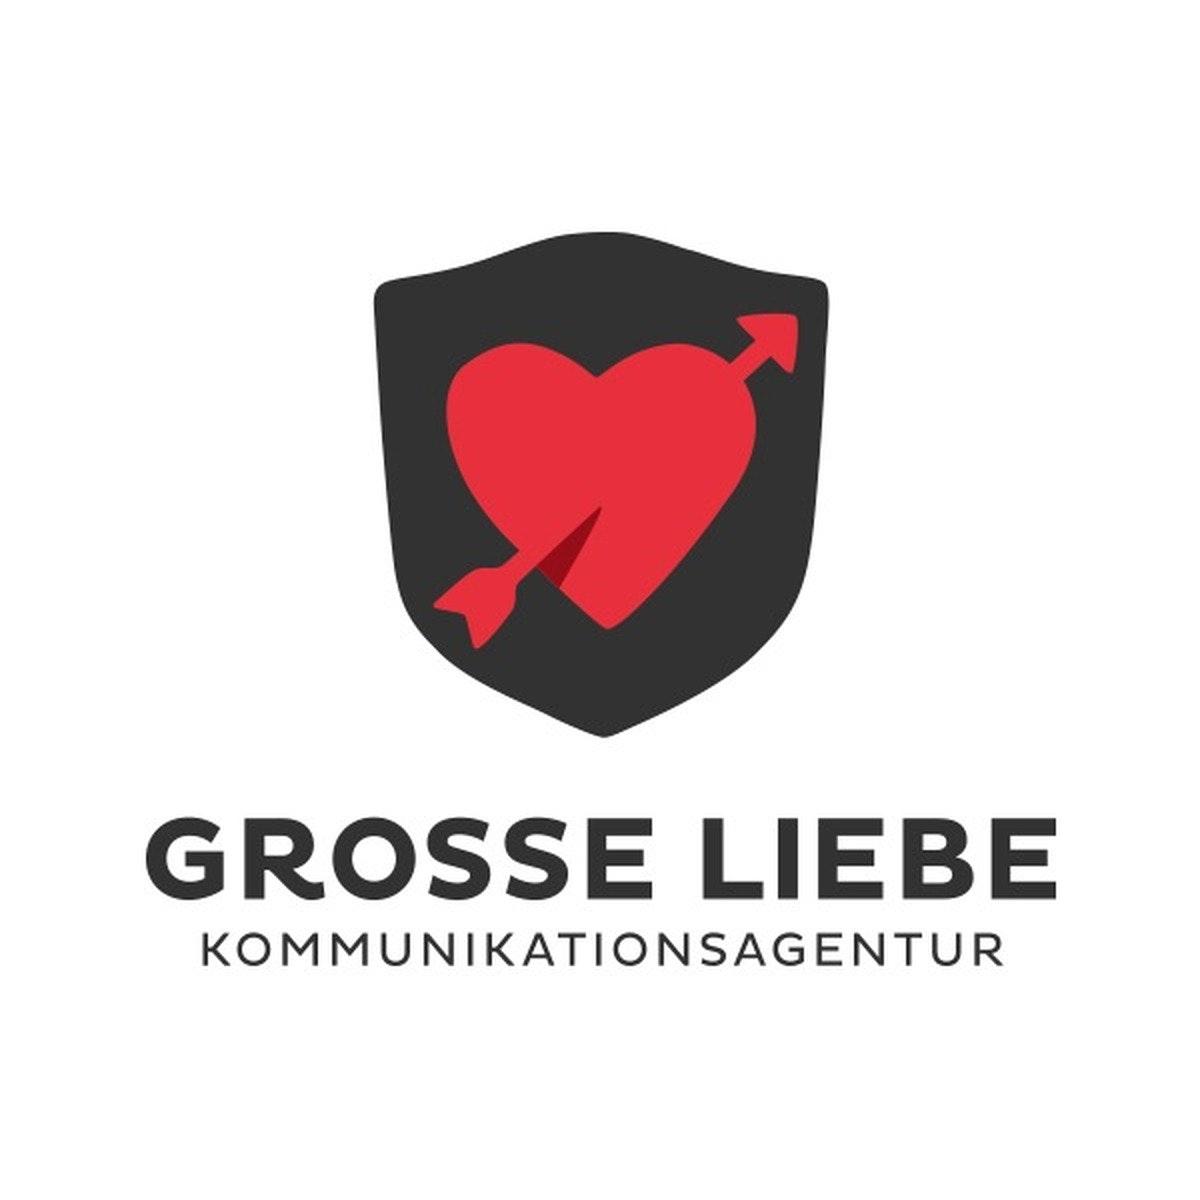 Grosse Liebe GmbH